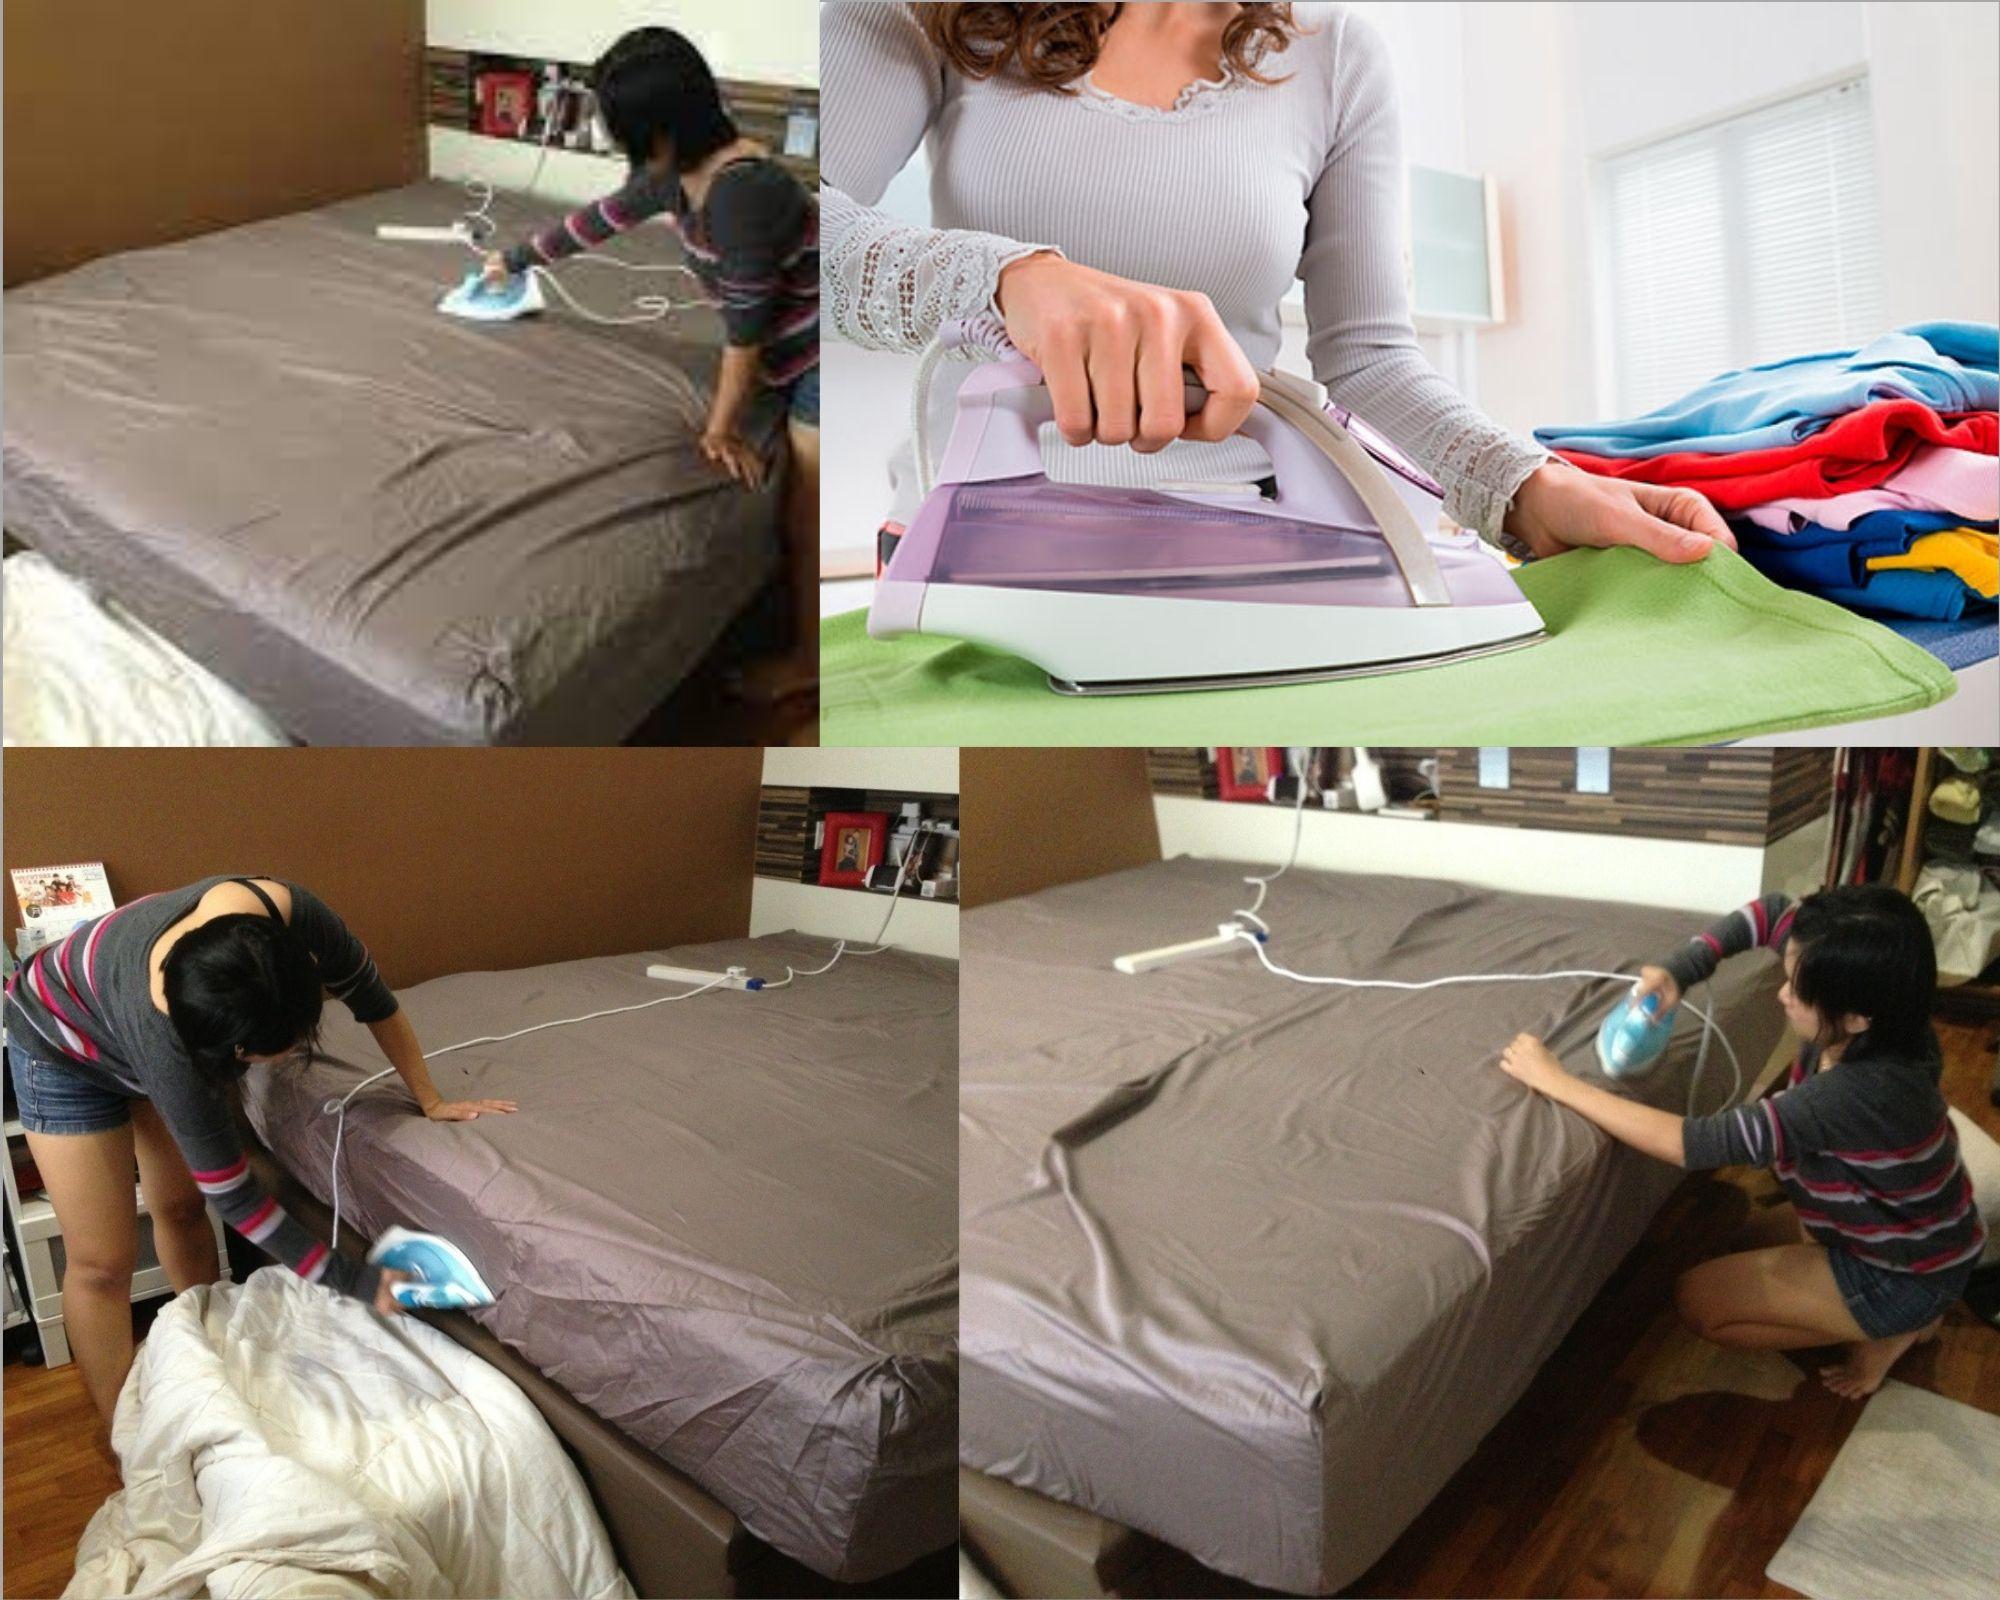 Глажка утюгом постели